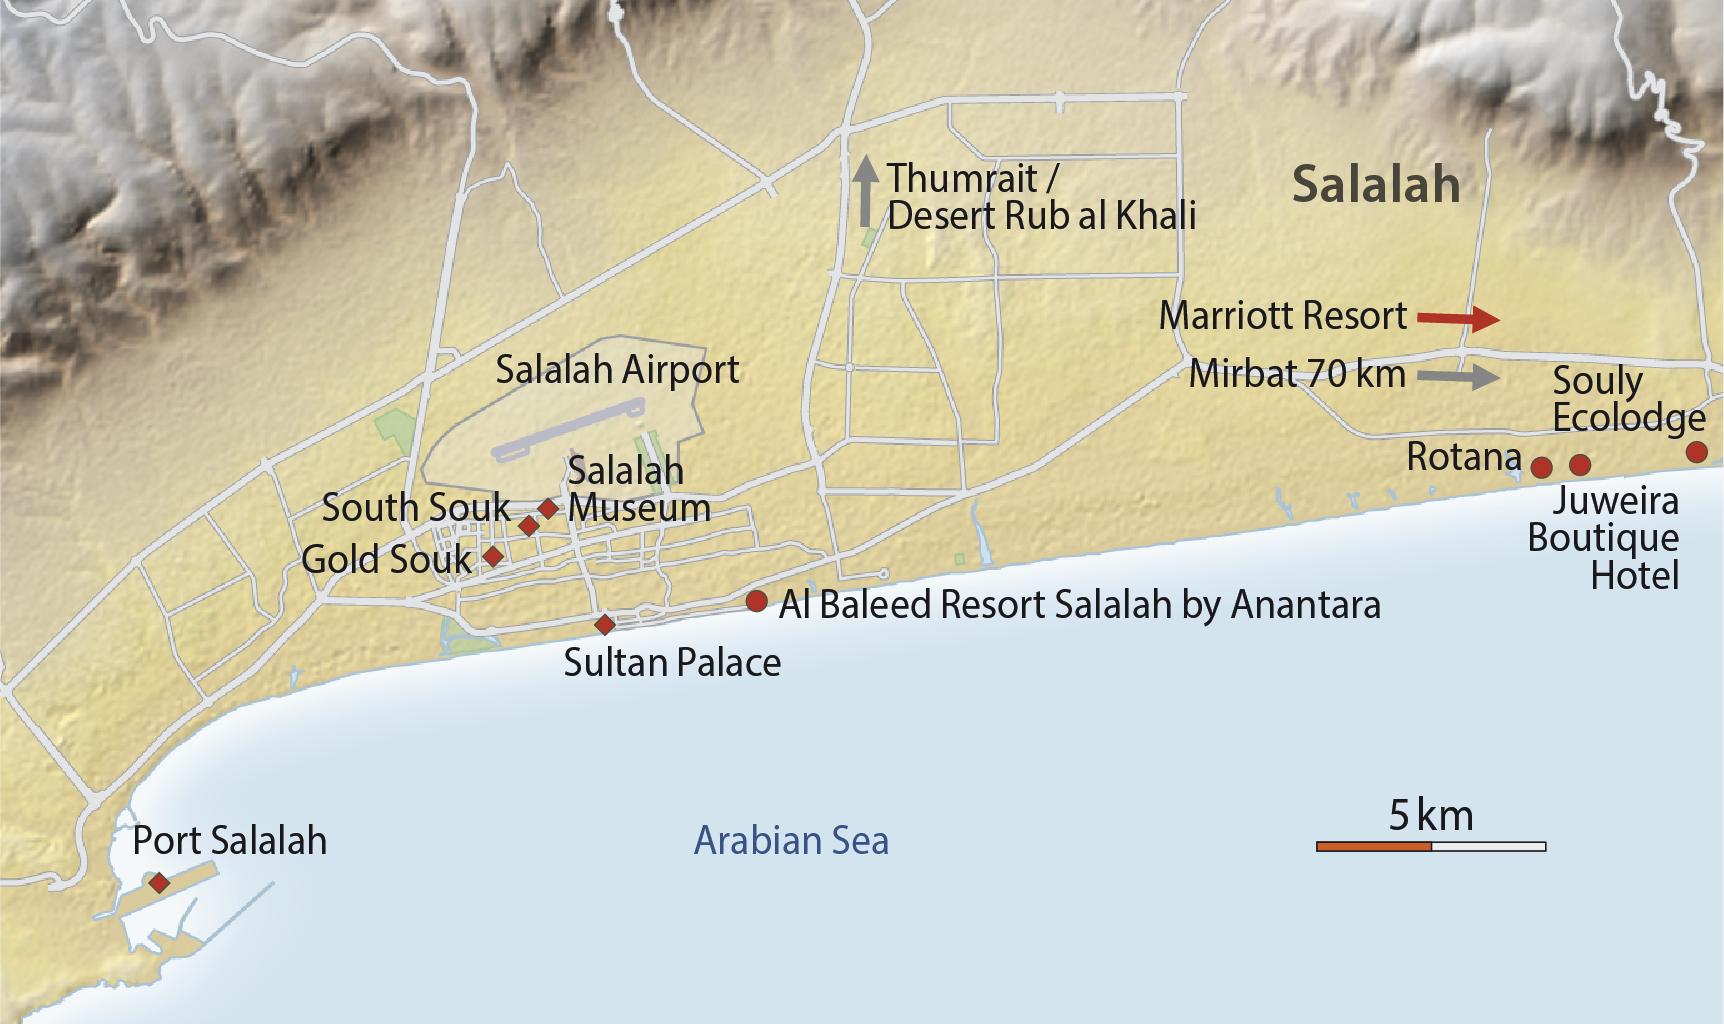 Karte Oman Salalah.Ferien In Salalah Im Oman Vom Spezialisten Let S Go Tours